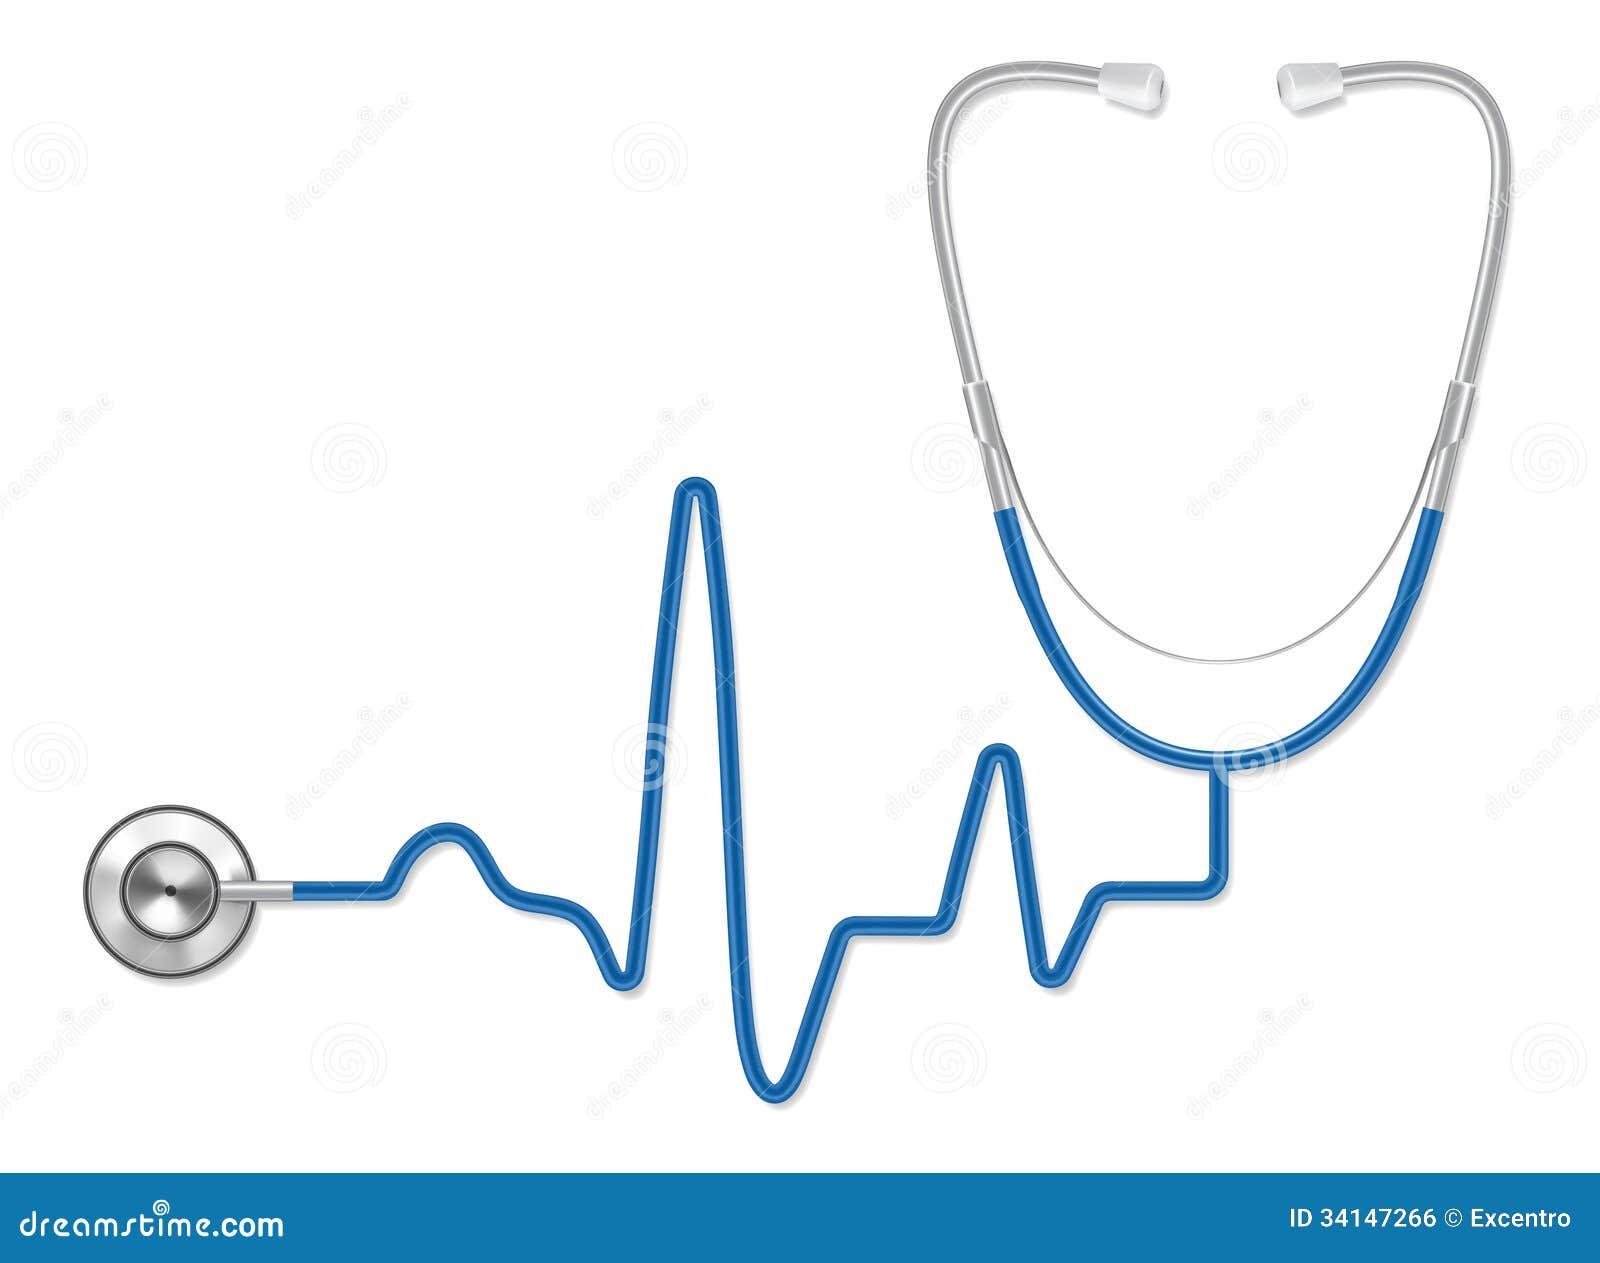 stethoscope stock vector illustration of medicine pulse 34147266